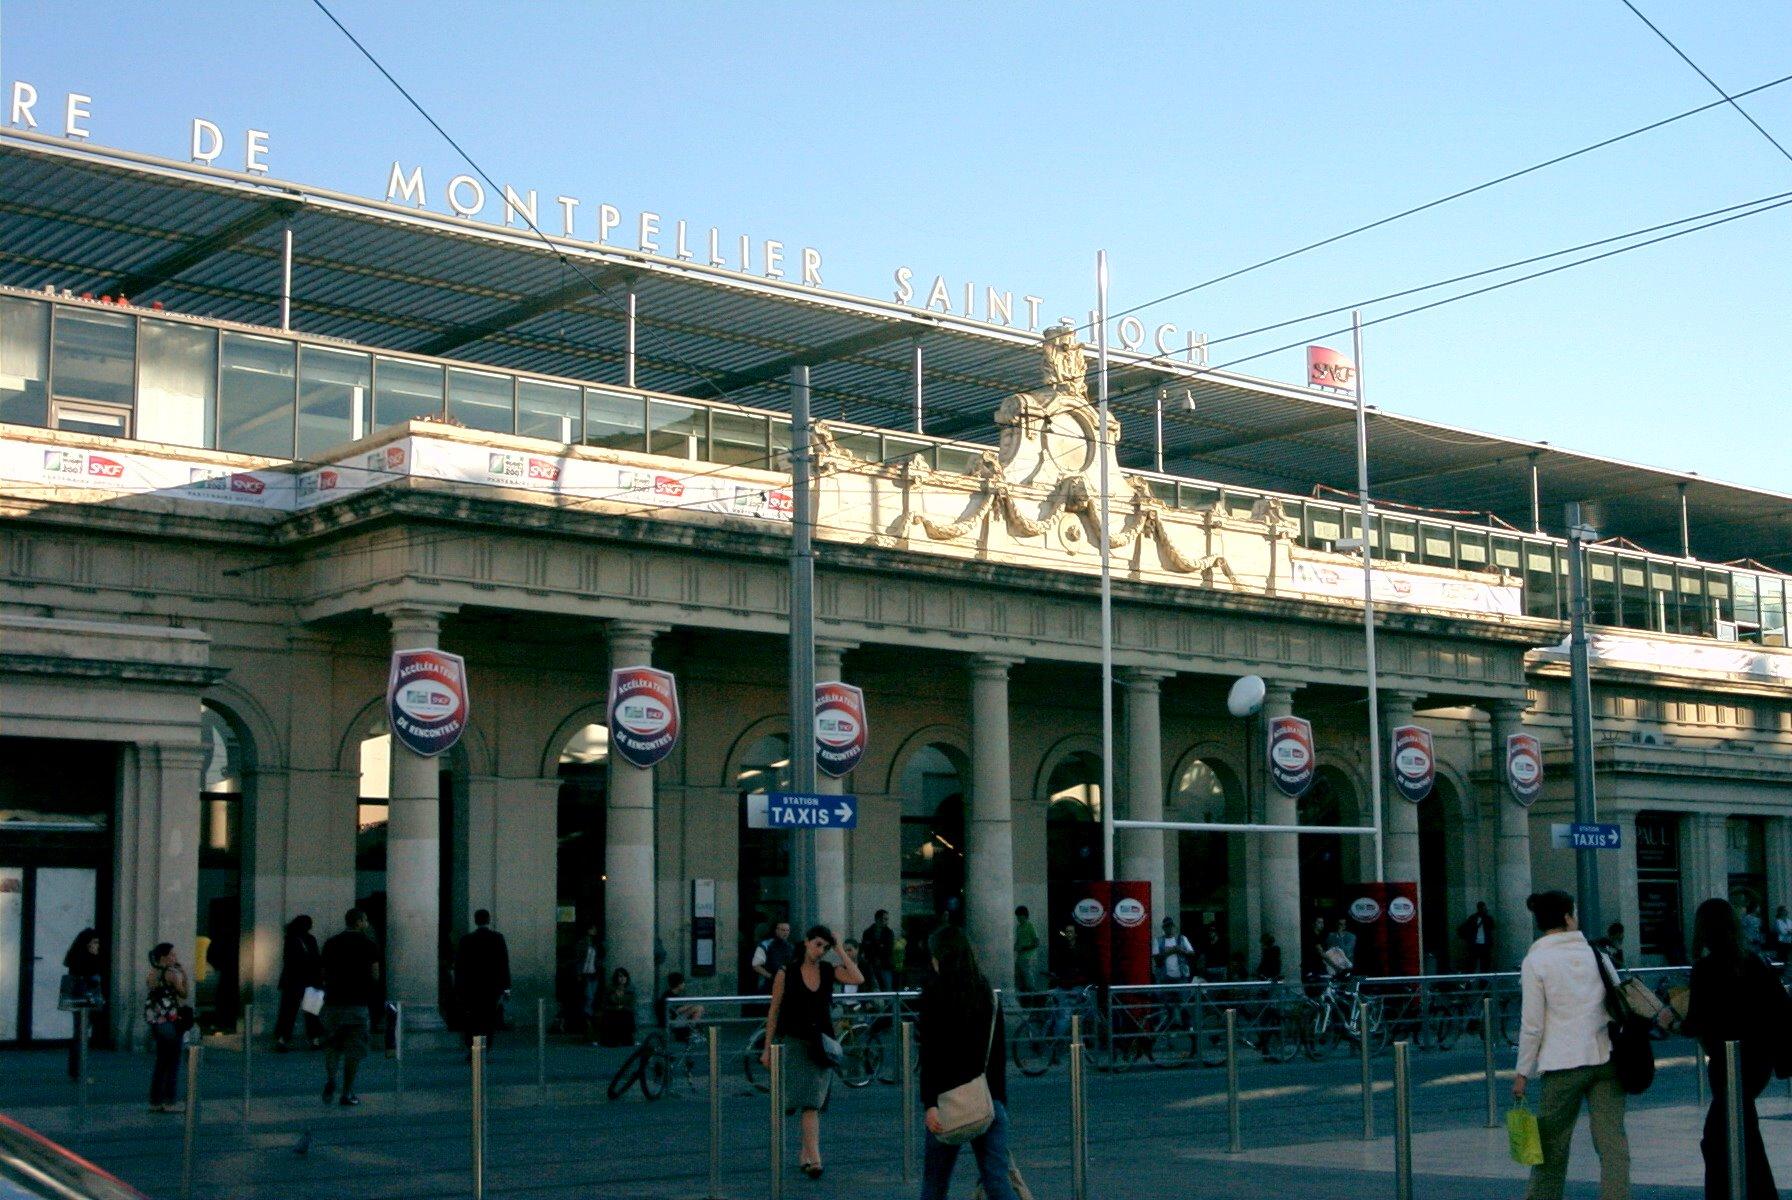 Bus Gare Saint Charles Marseille Centre Ville Arret Canebi Ef Bf Bdre